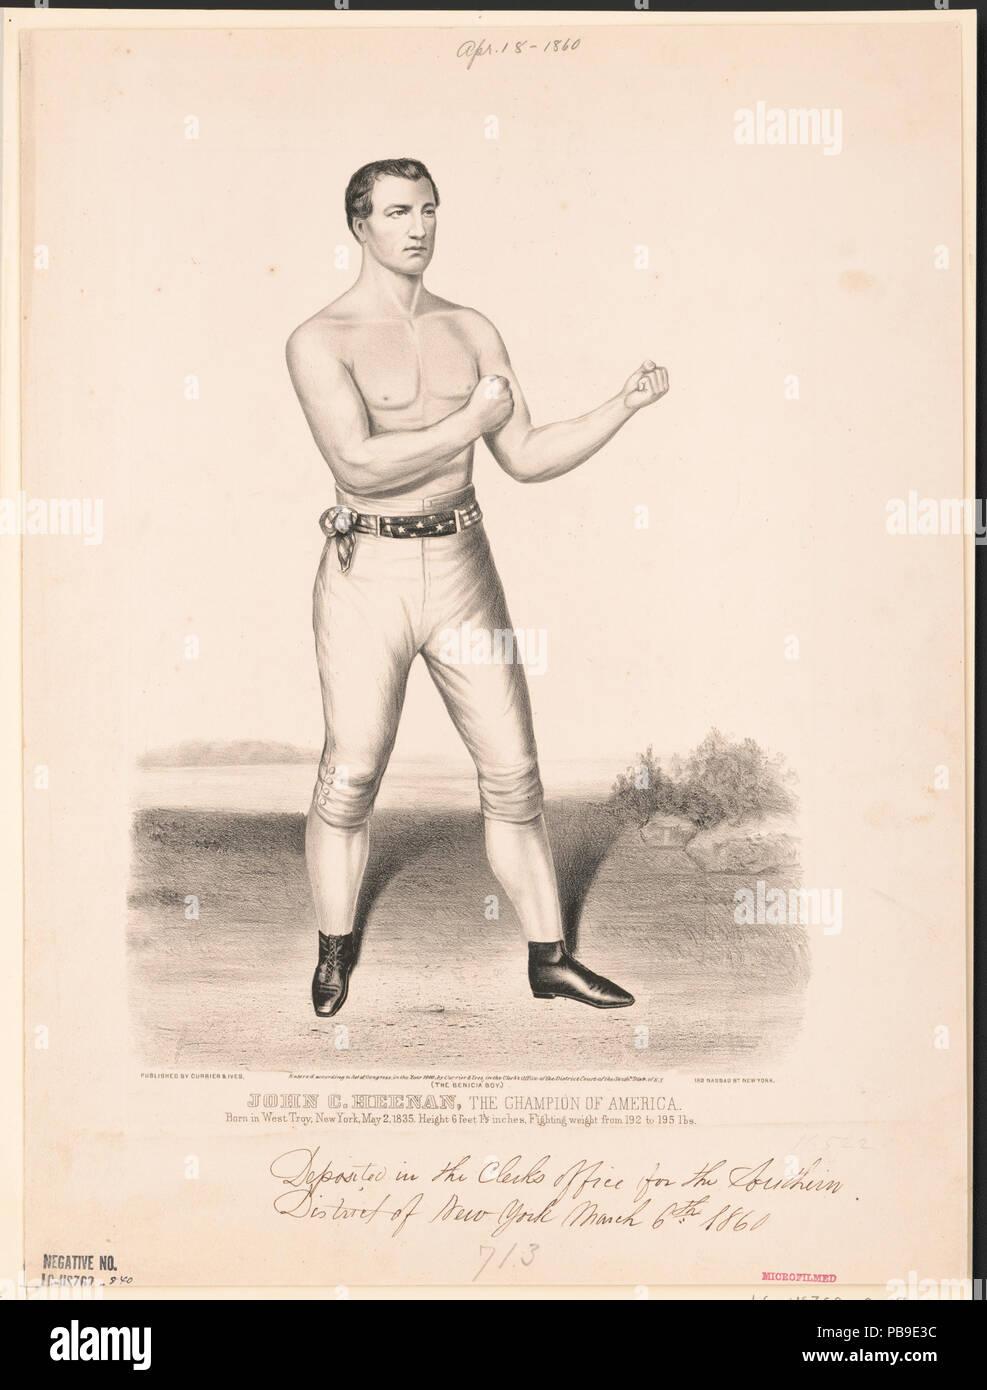 836 John C. Heenan, the champion of America- (the benicia boy) LCCN2002707678 - Stock Image